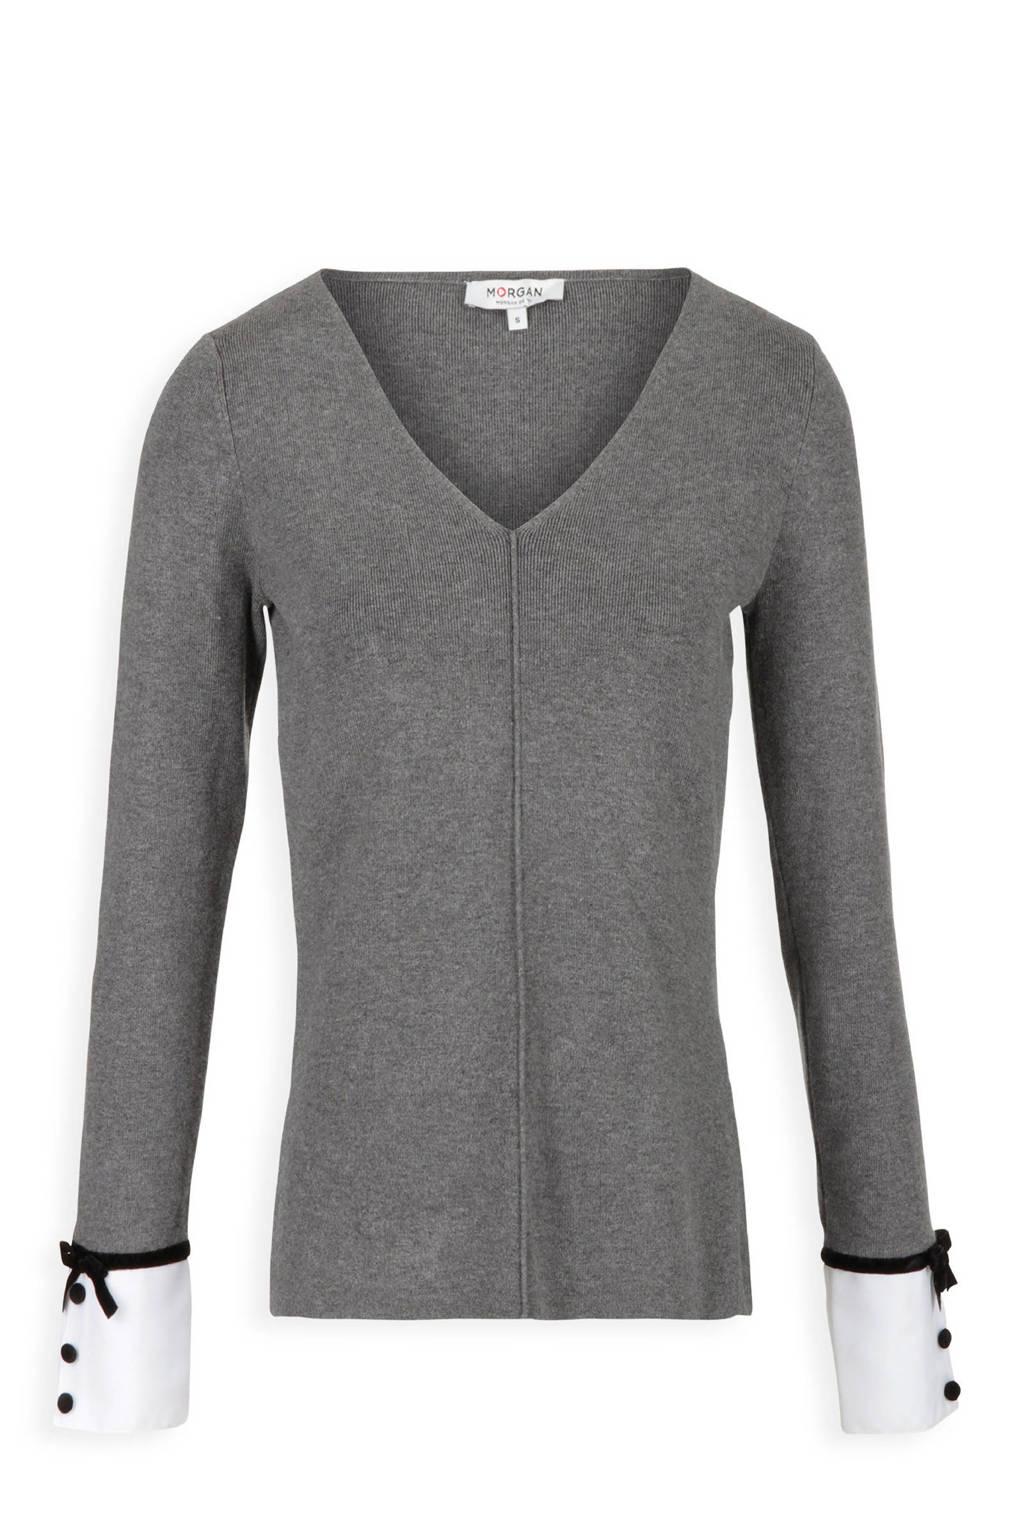 Morgan trui met blouse detail grijs, Grijs